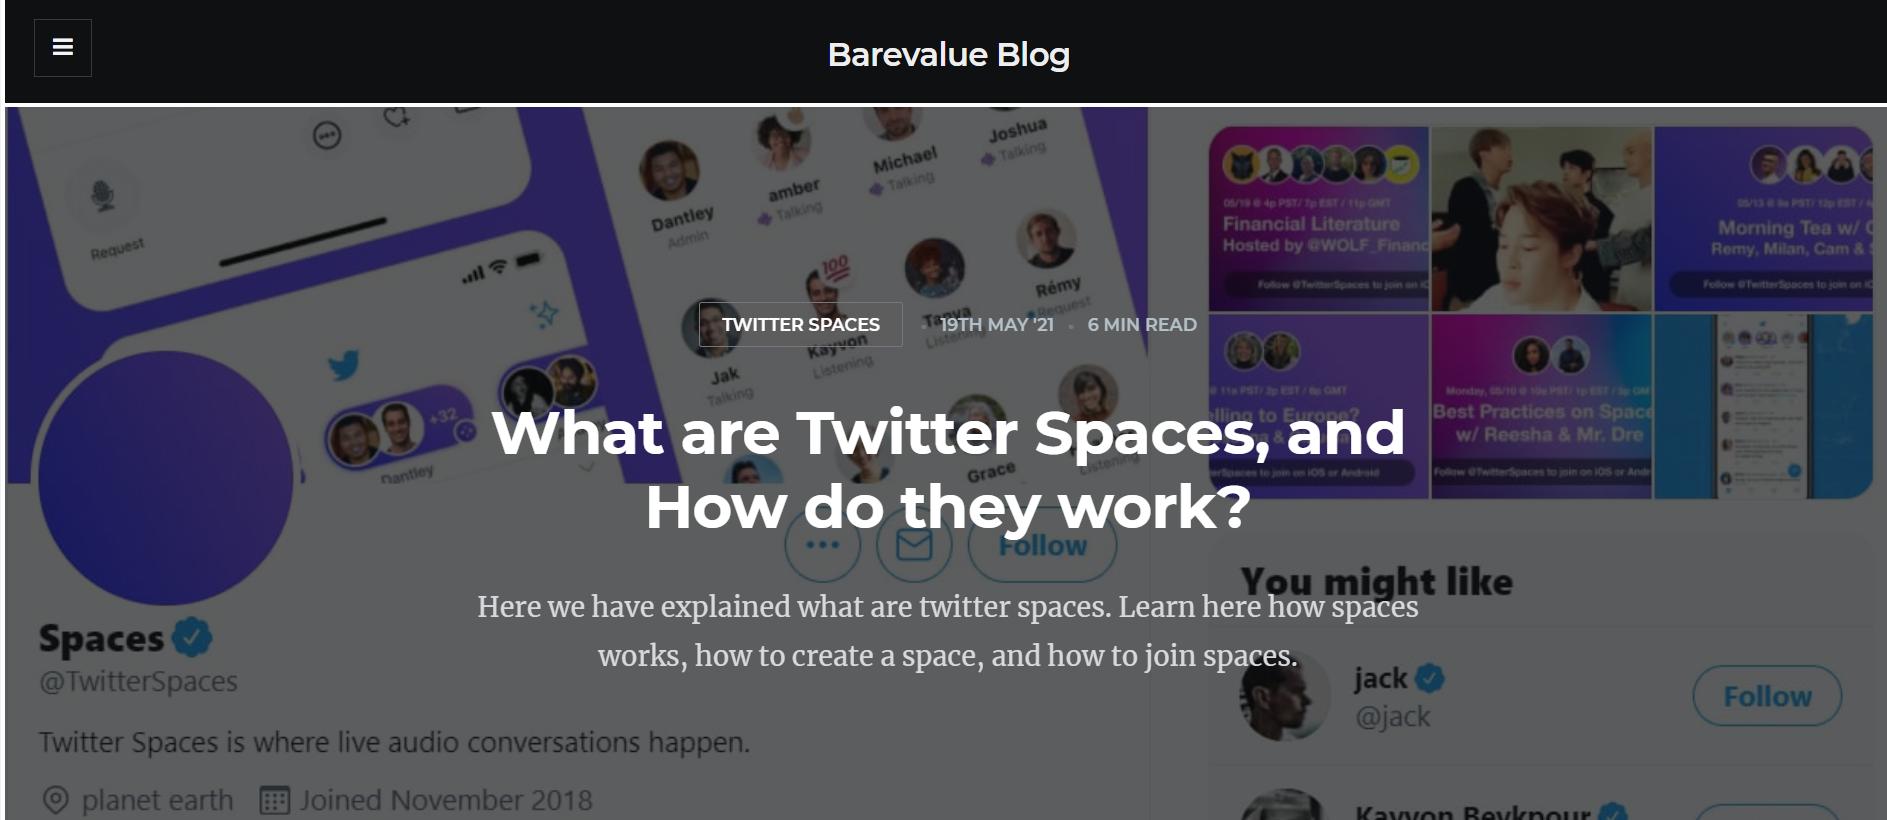 Barevalue Blog